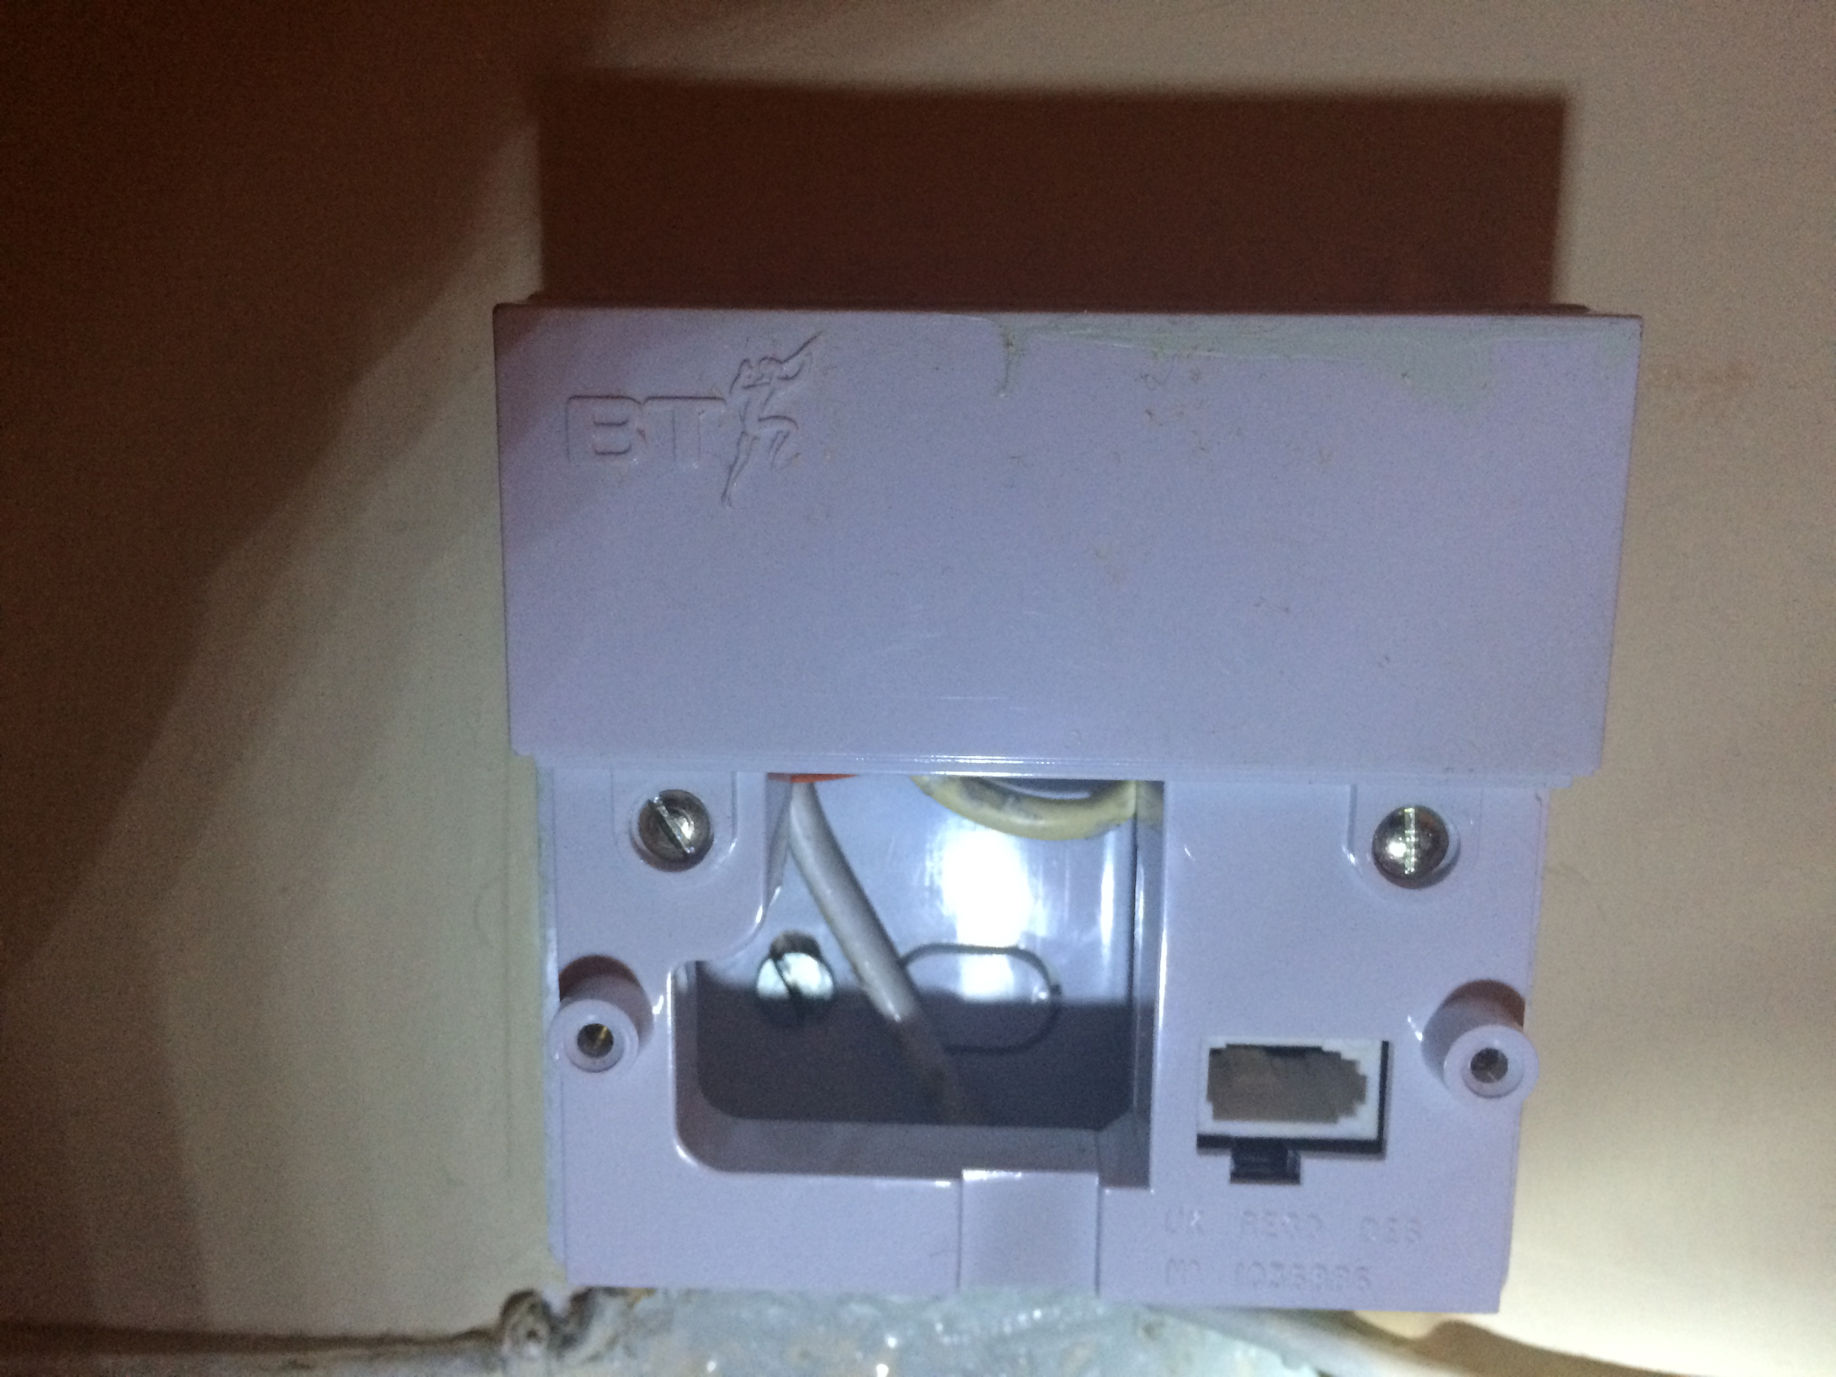 bt infinity master socket wiring diagram 1969 camaro community